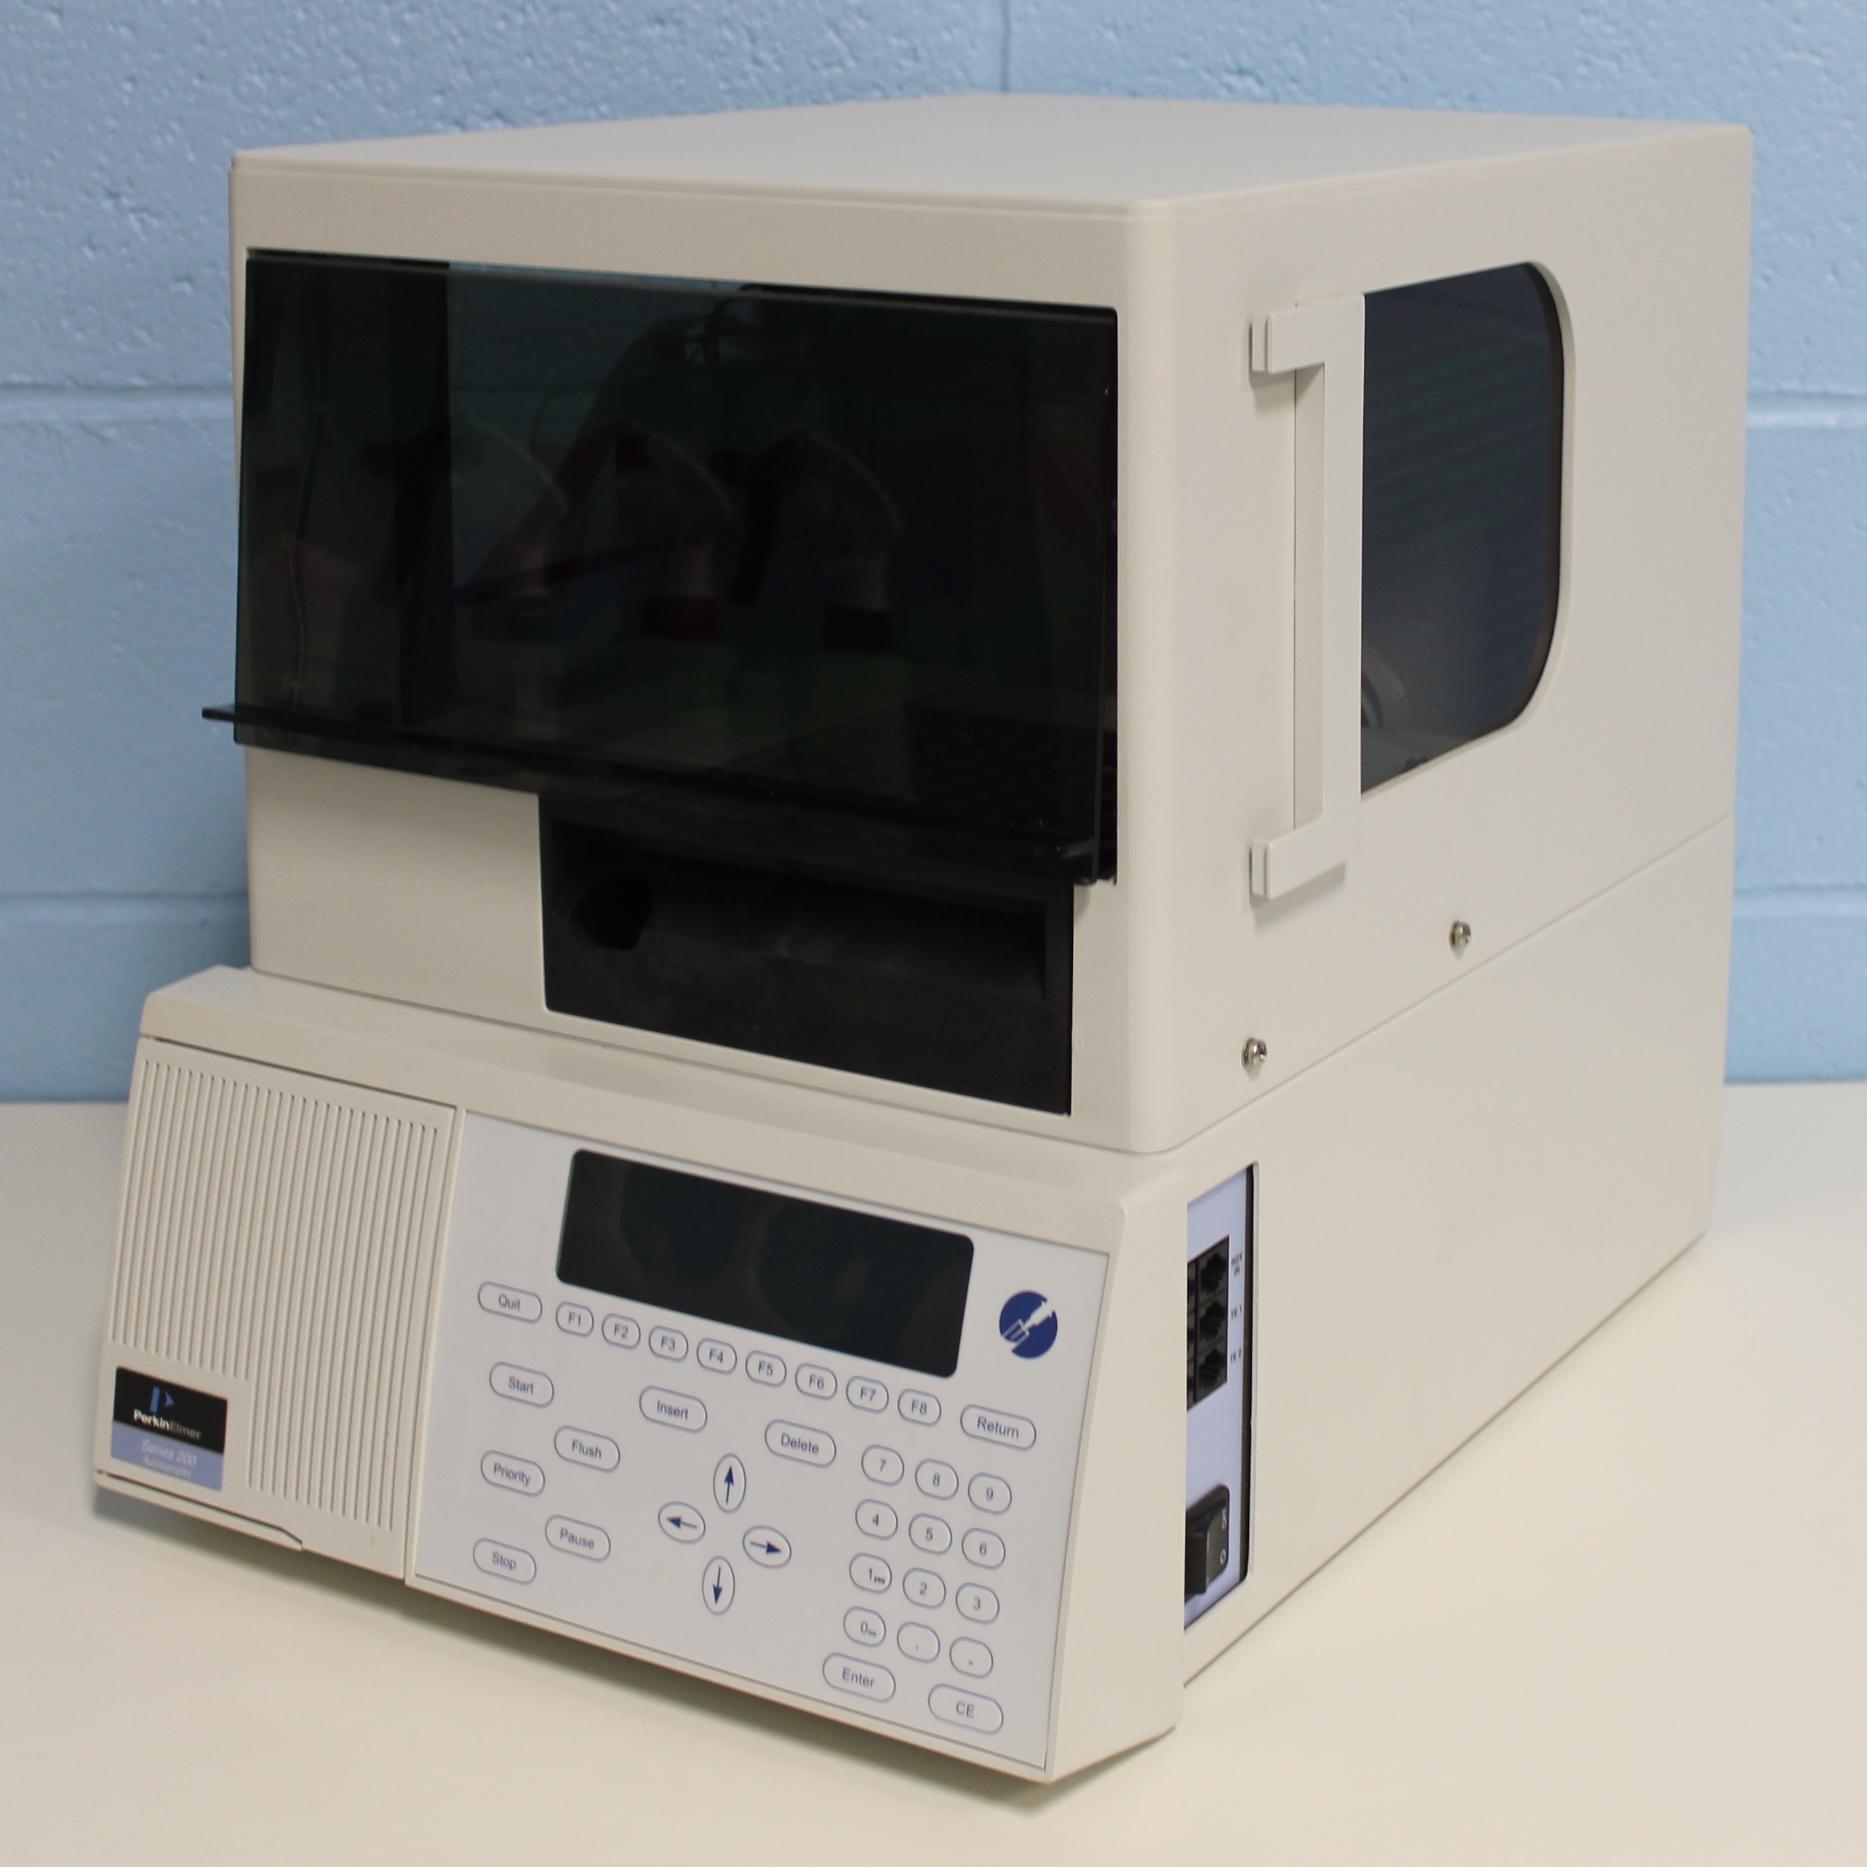 Perkin Elmer Series 200 Autosampler Image